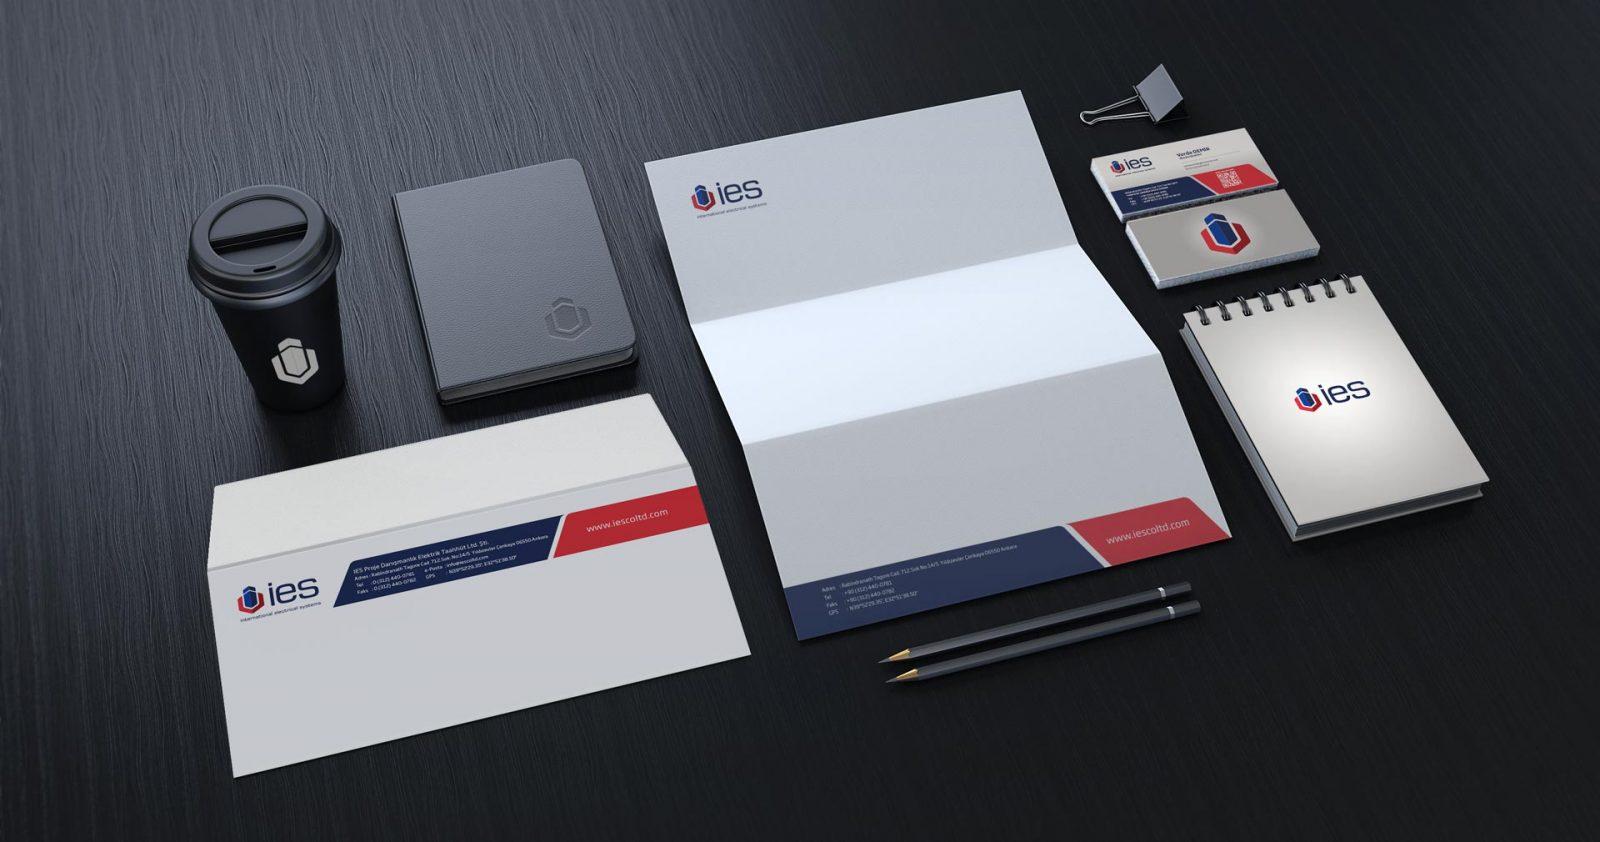 ies logo kurumsal kimlik tasarımı 05